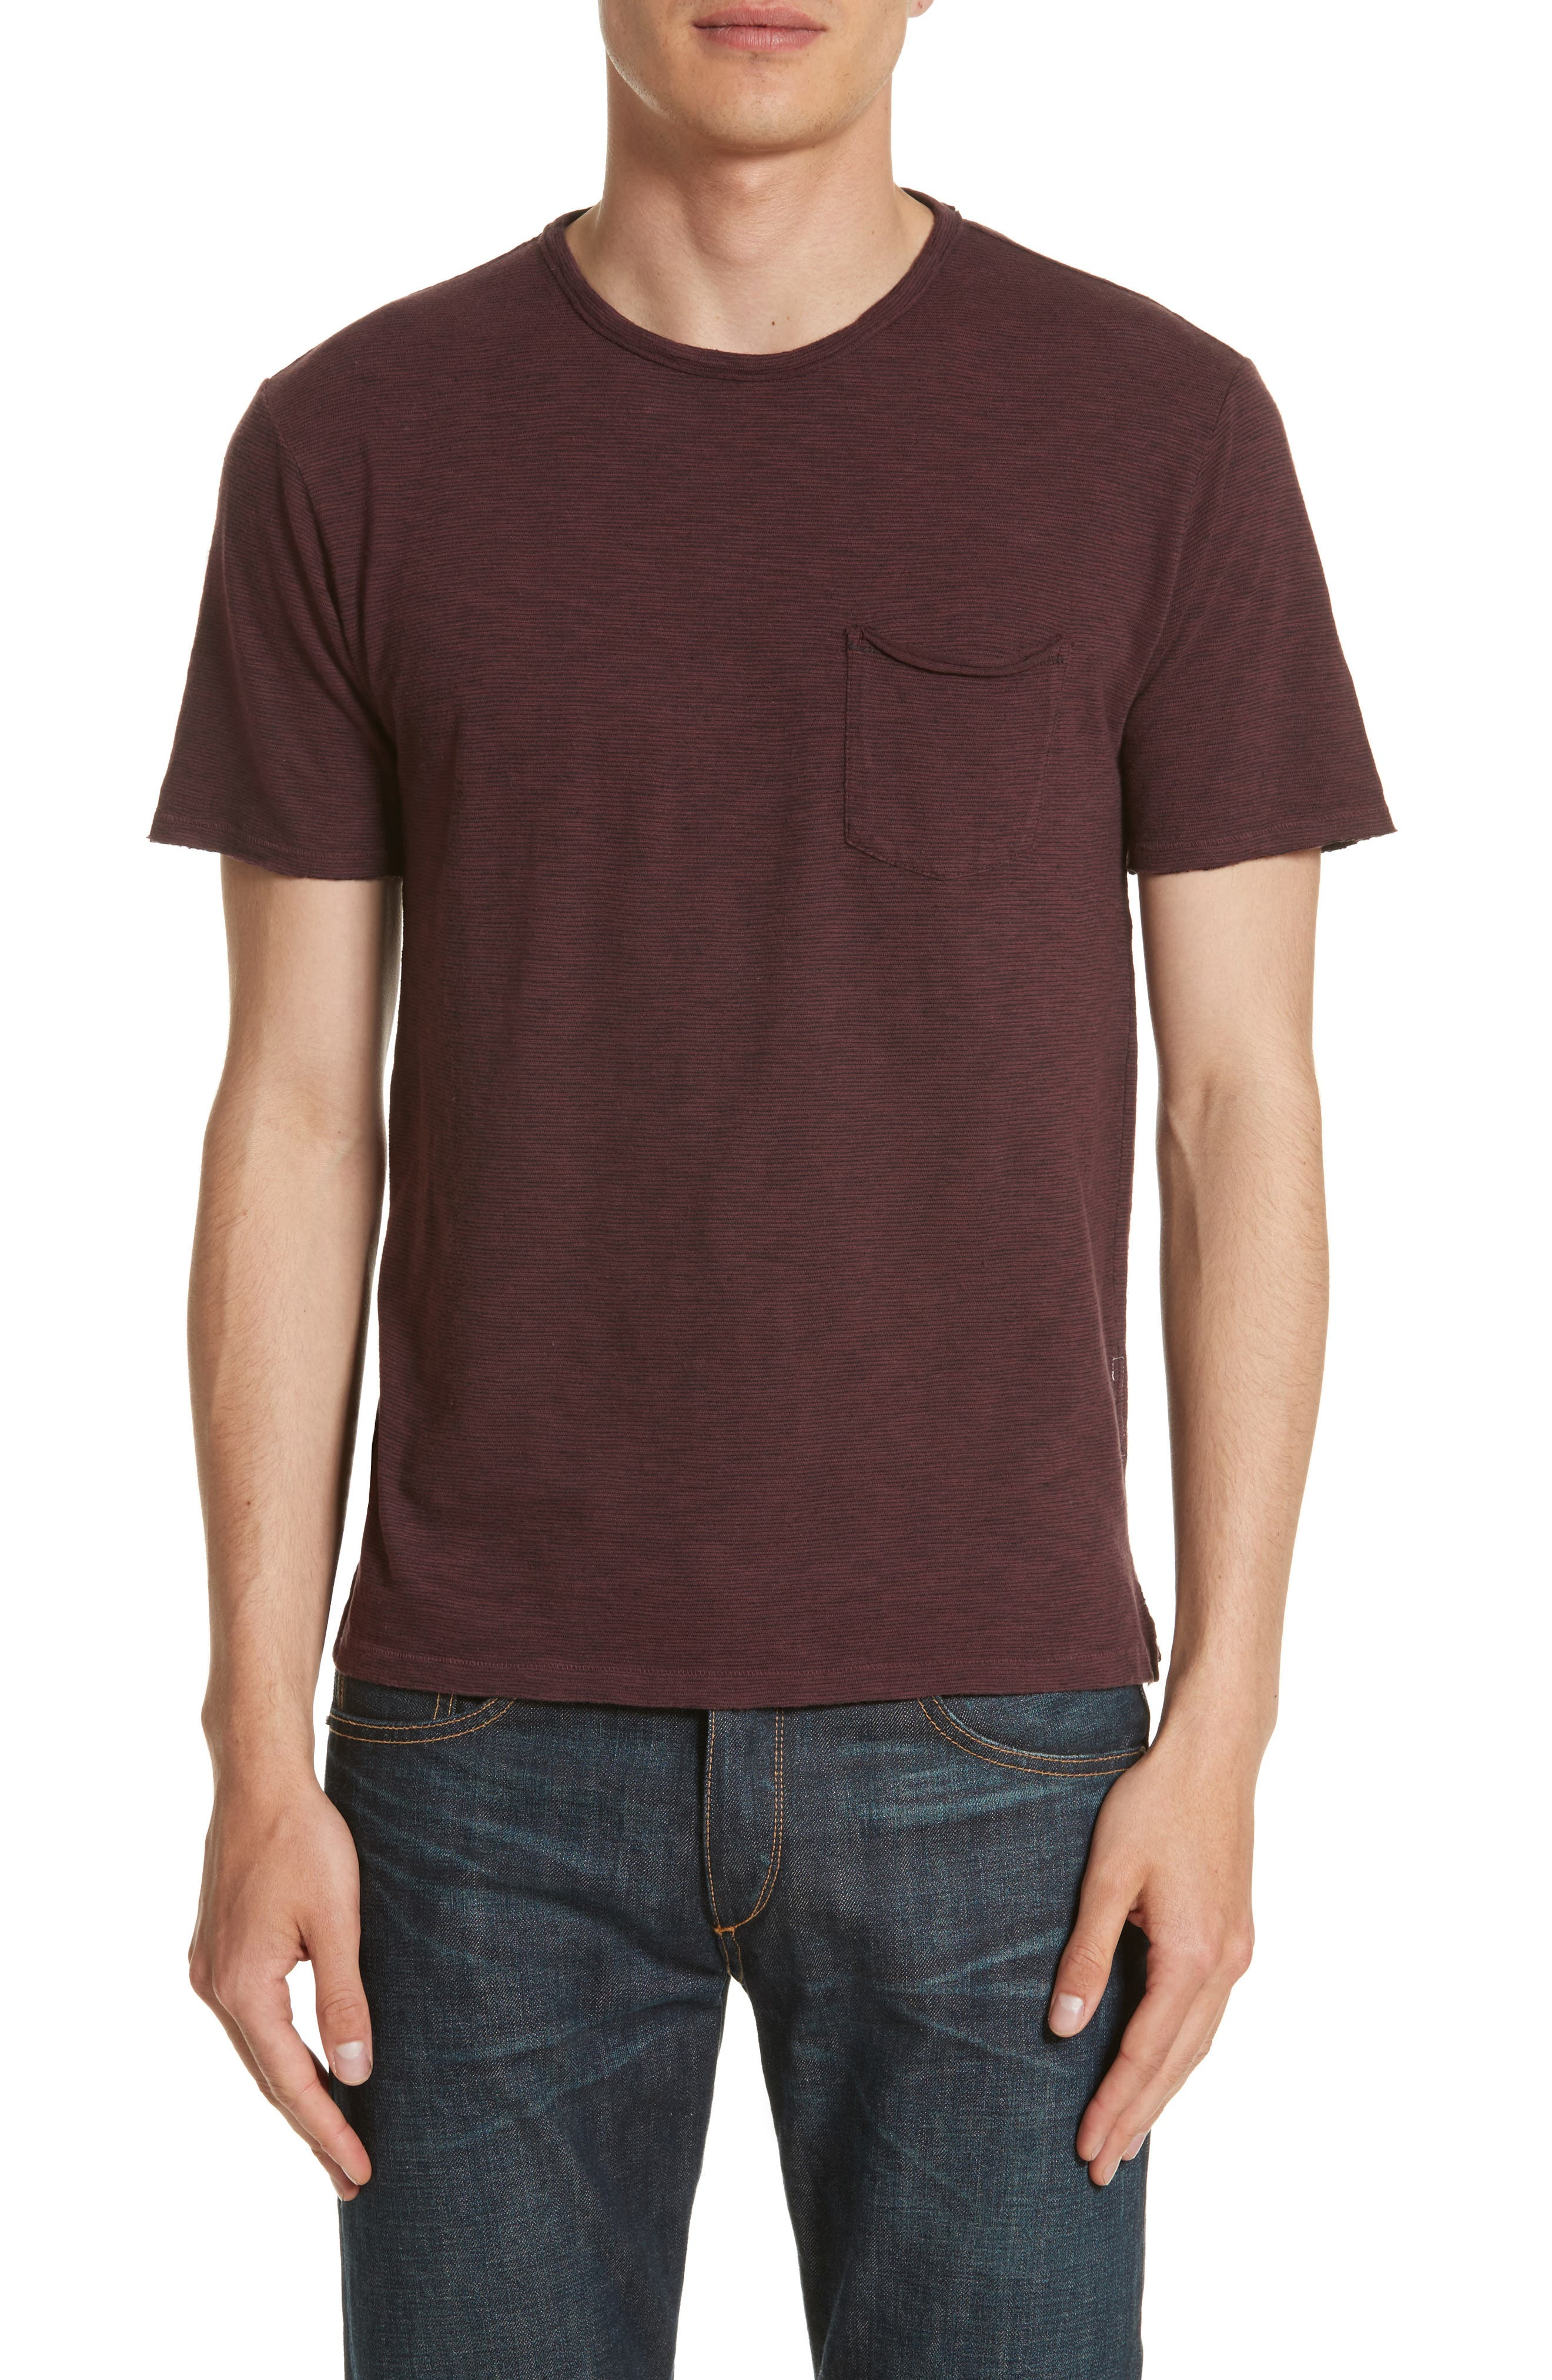 Owen Pocket T-Shirt,                         Main,                         color, Mohagany